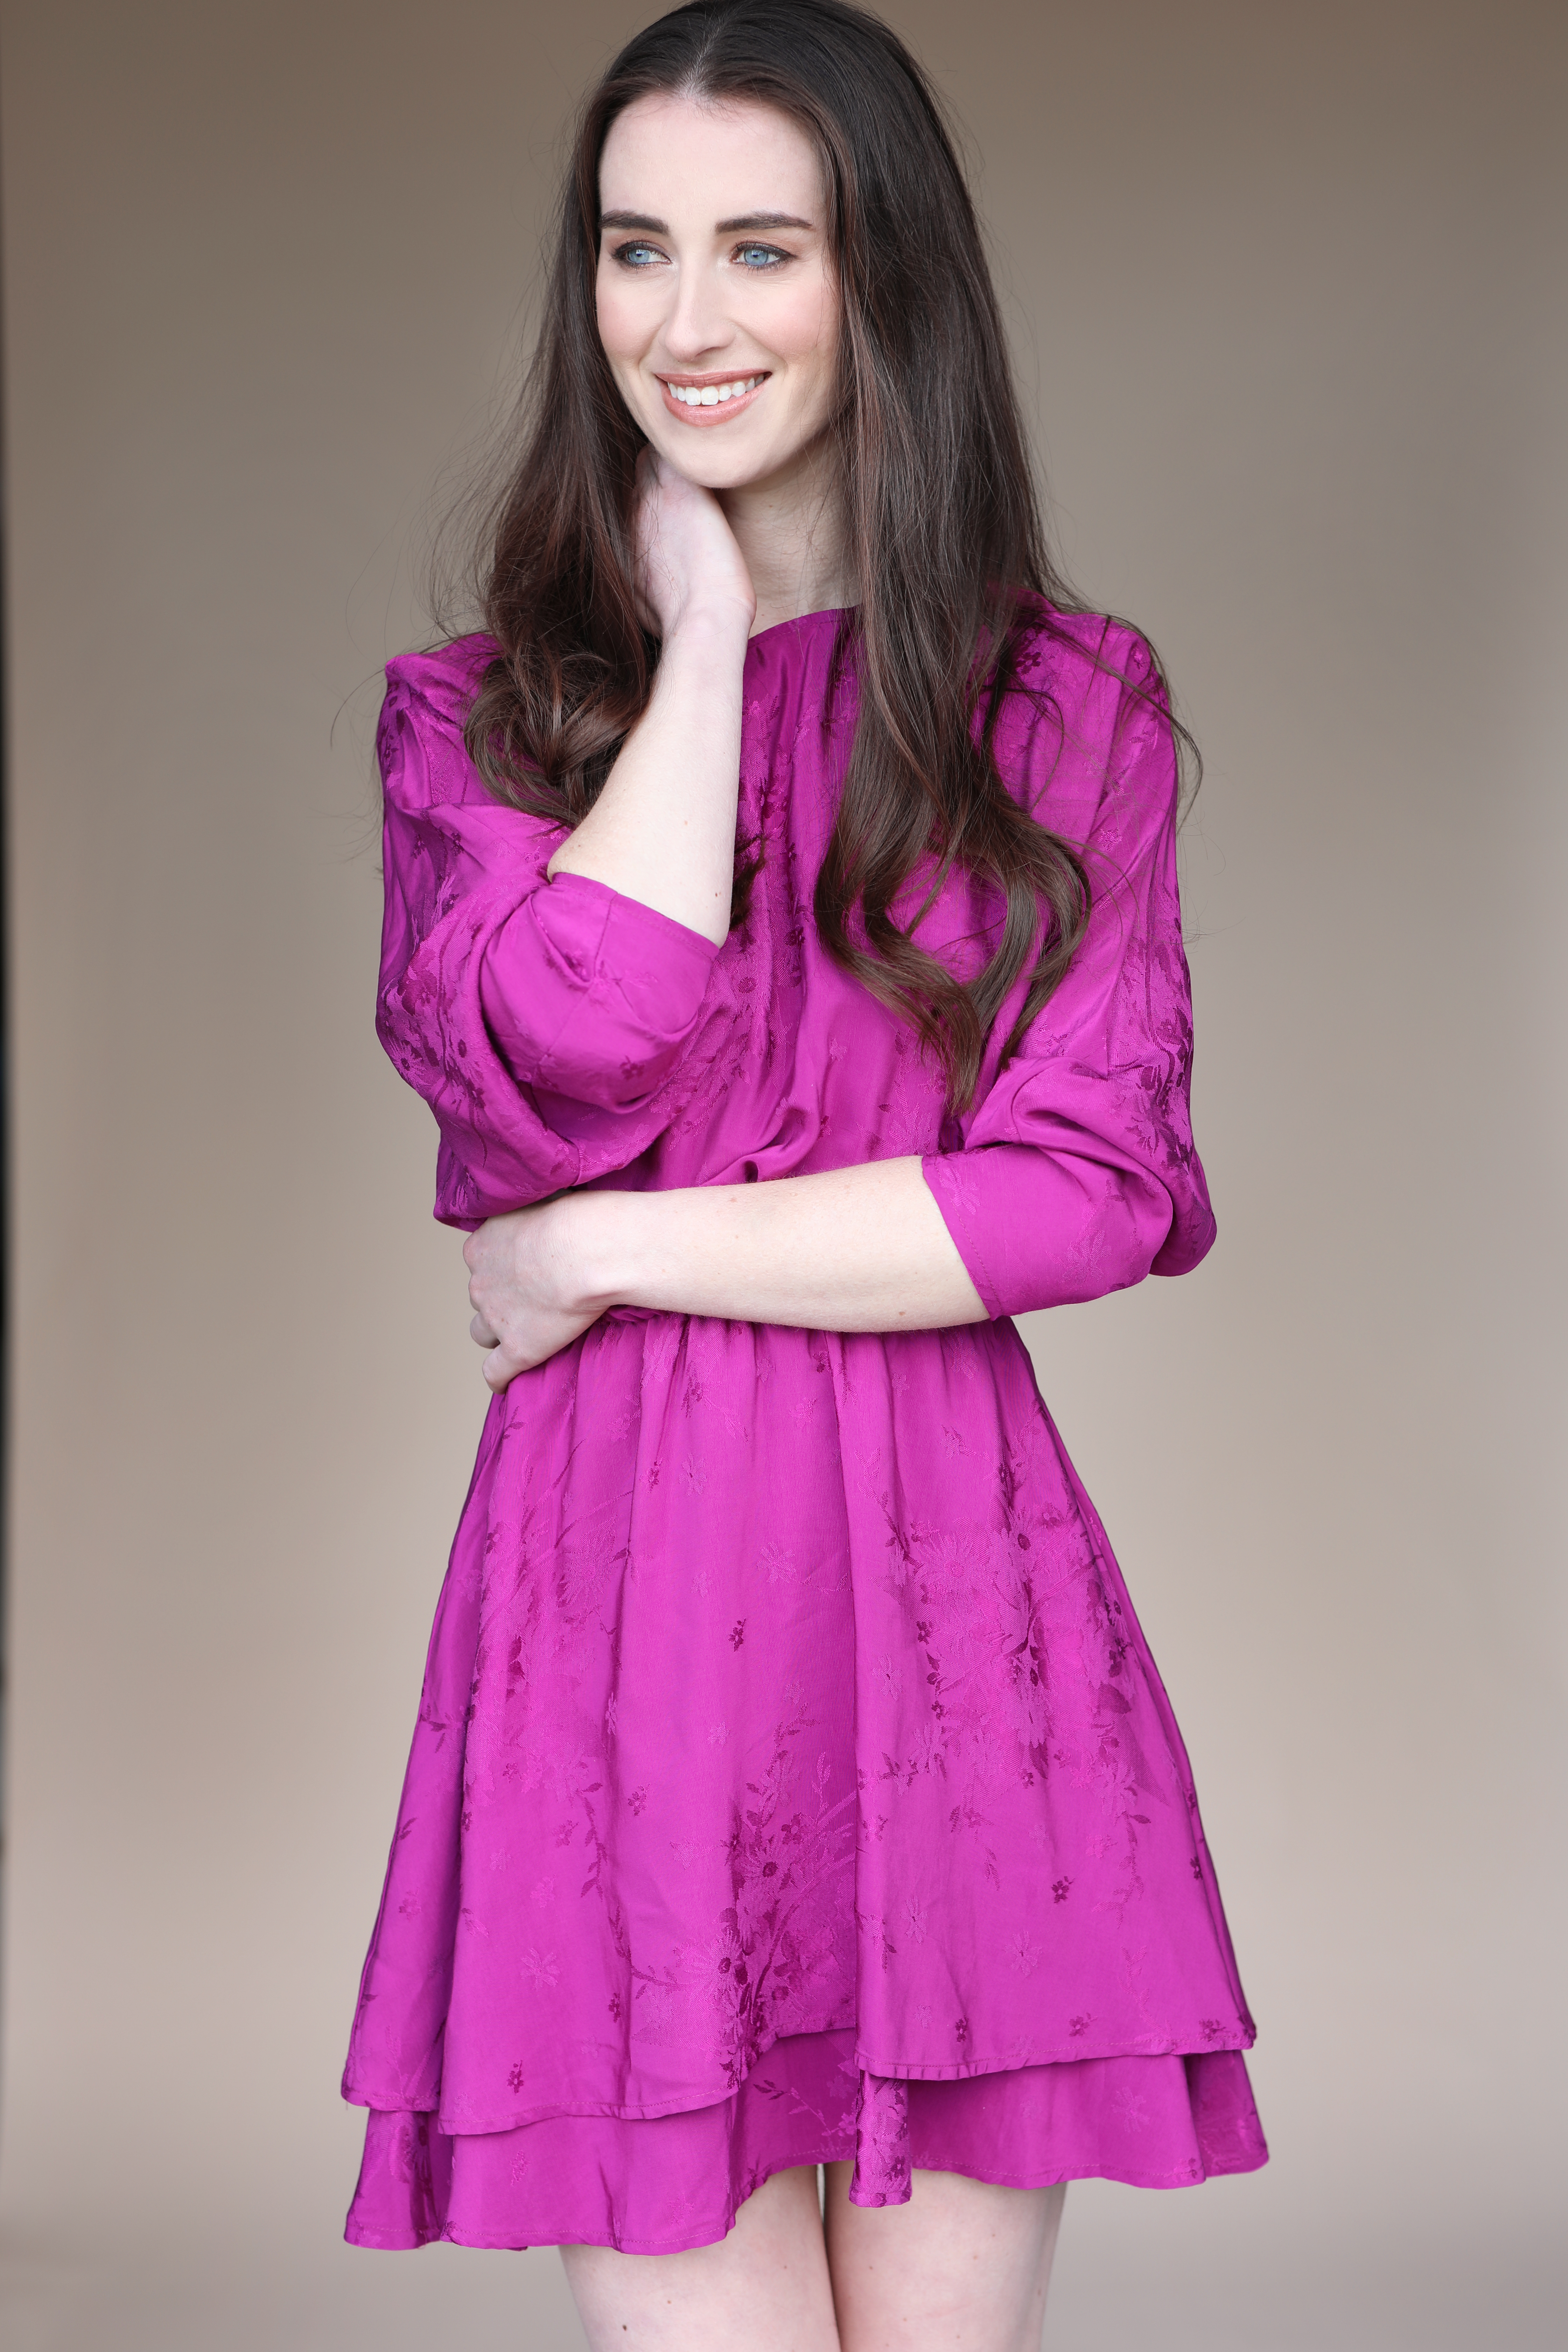 Shine-Female-Model-Laura-London-Fitness-Fashion-06.jpg#asset:51548